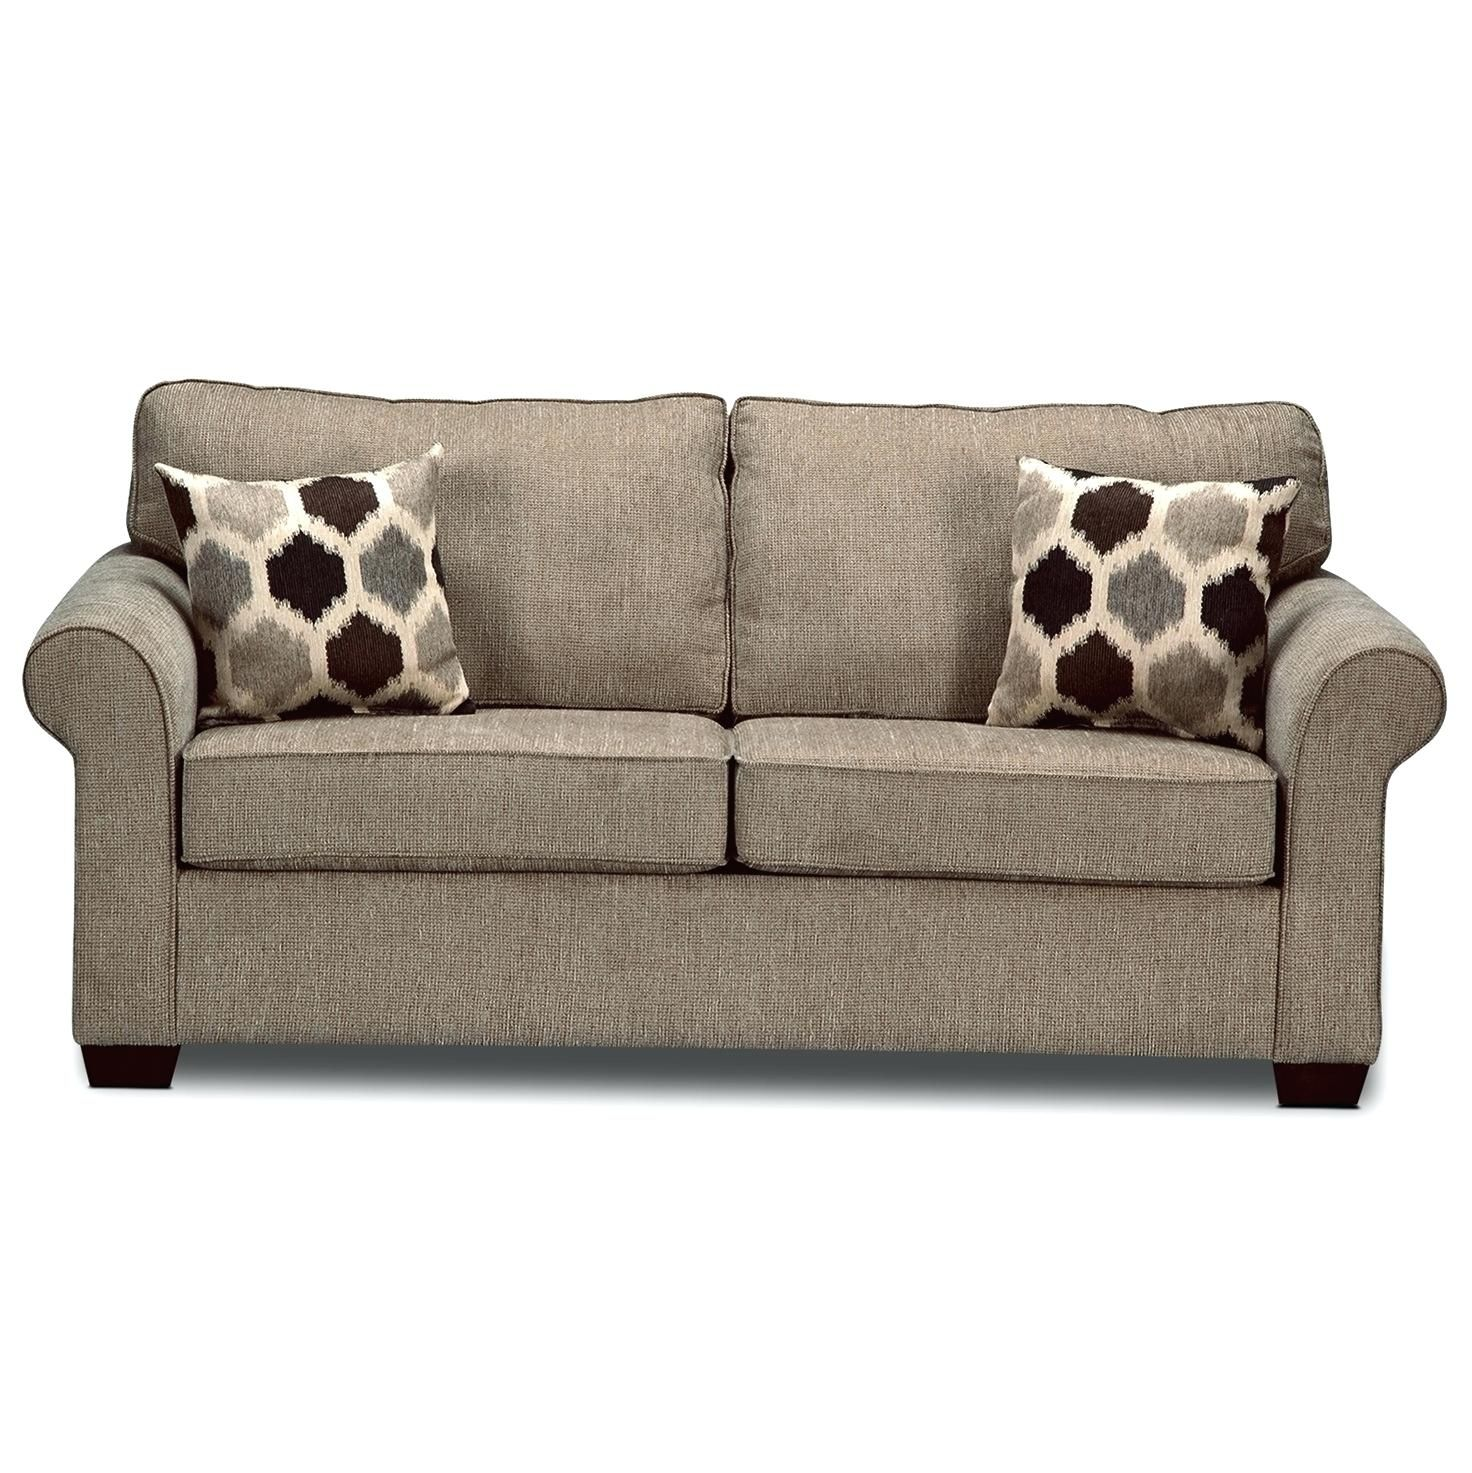 Sofa Bed Sheet Sets - singertexas.com